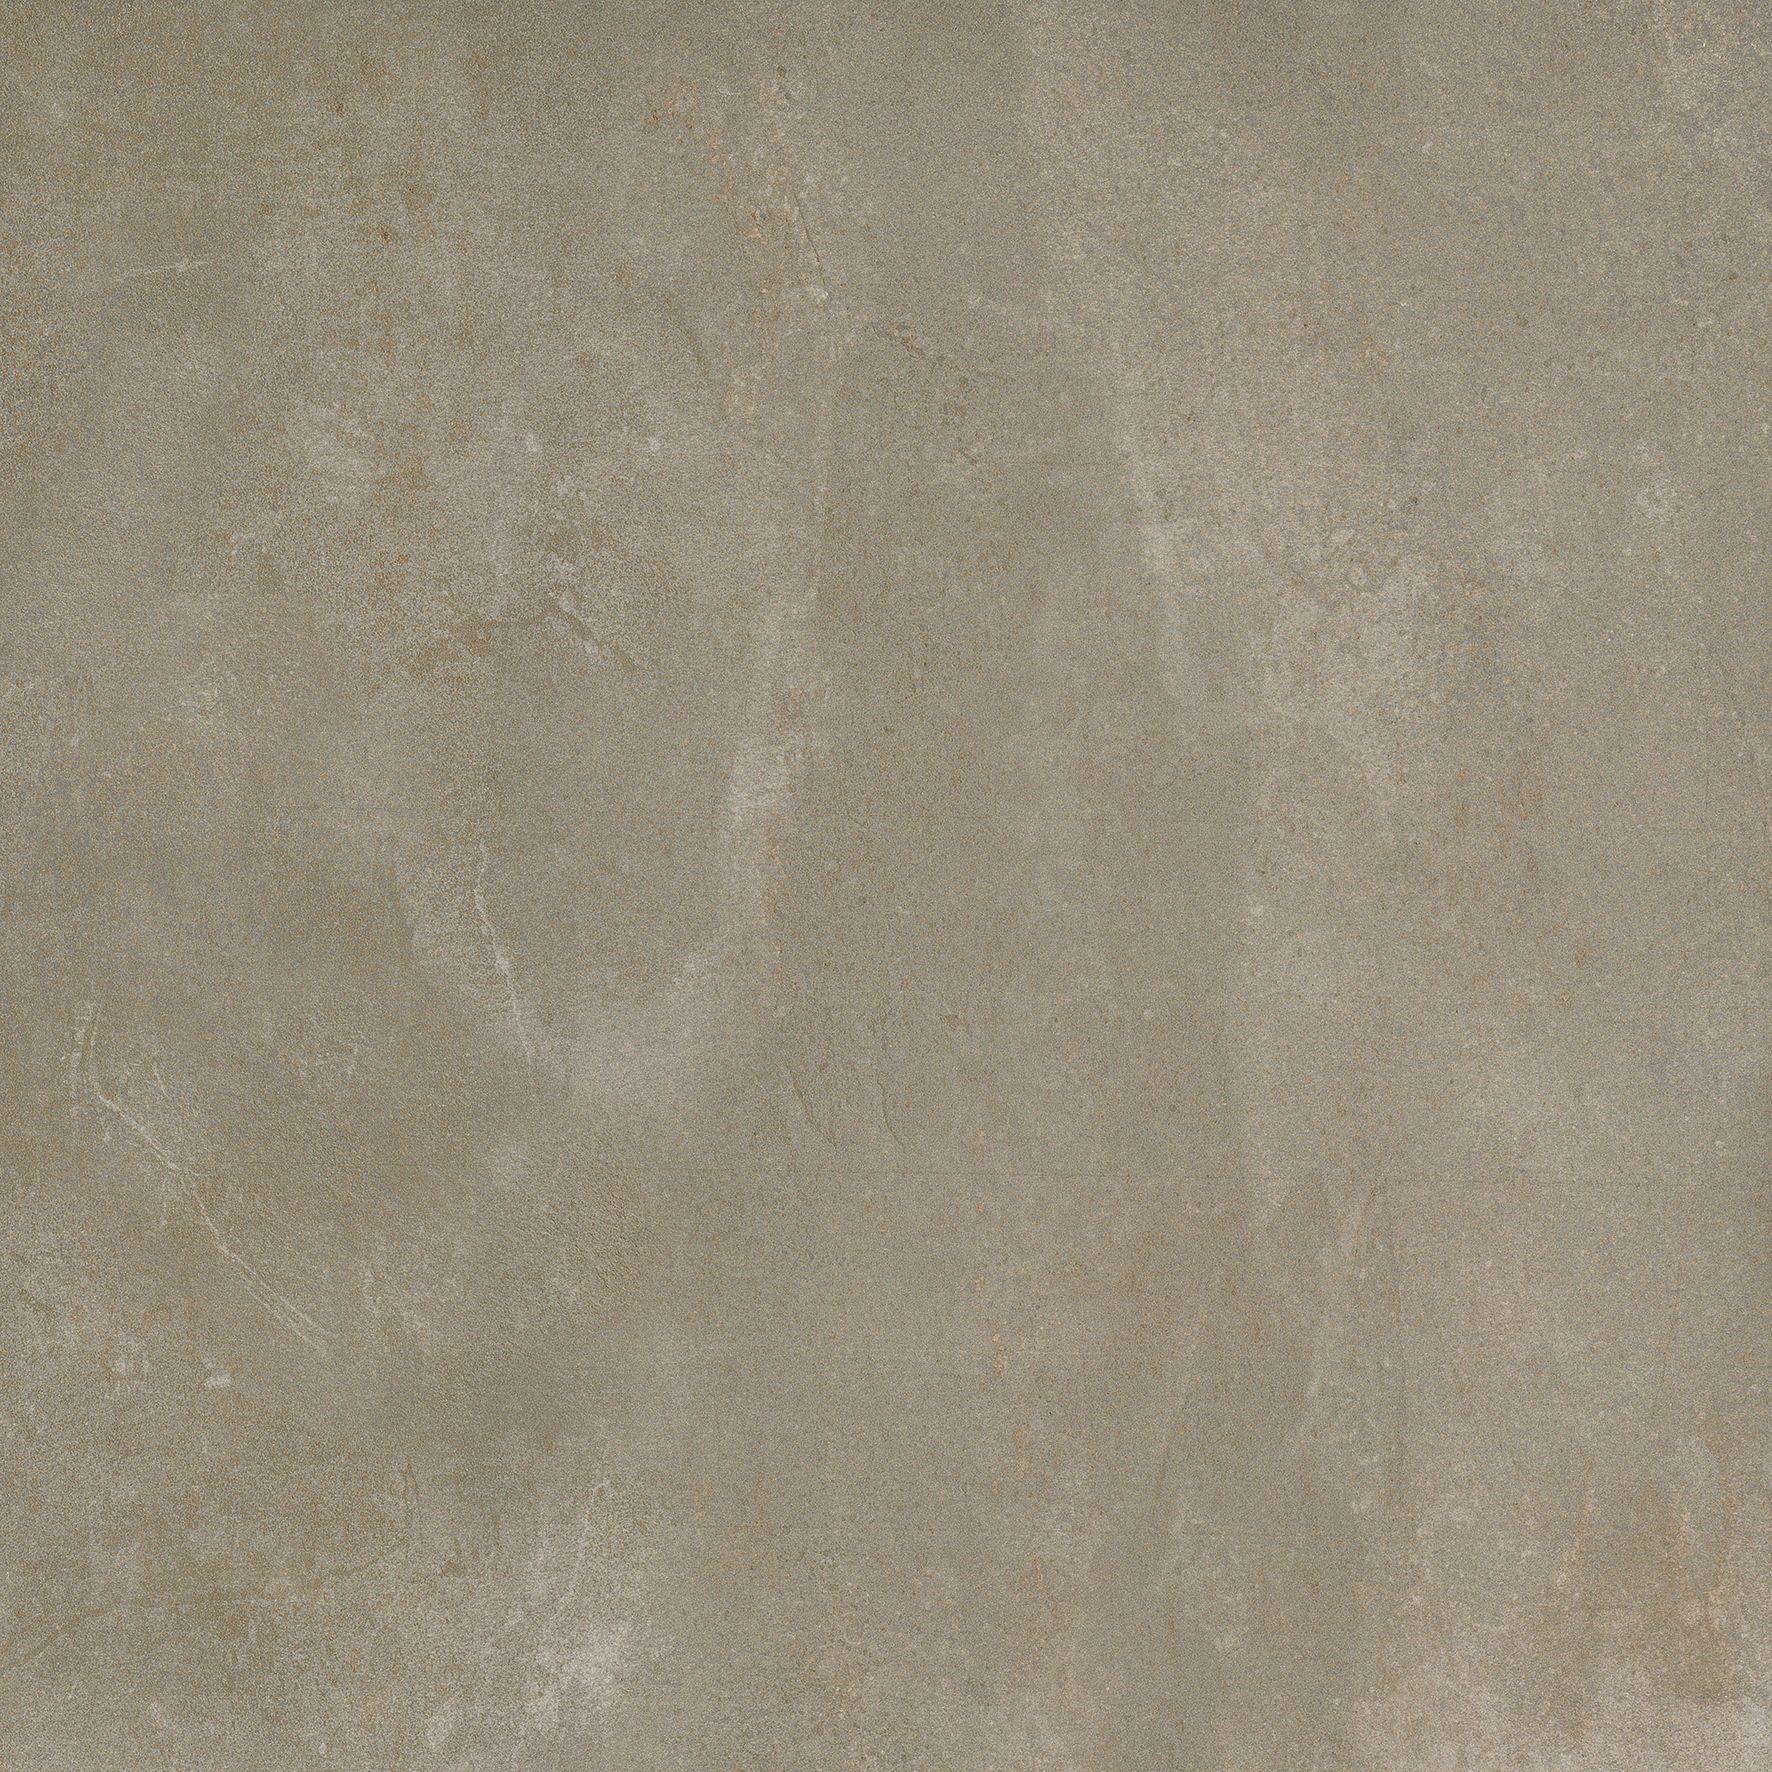 JÄÄK Klint beige KLI332A R10/B rect. 60x60x0,8 - Hansas Plaadimaailm